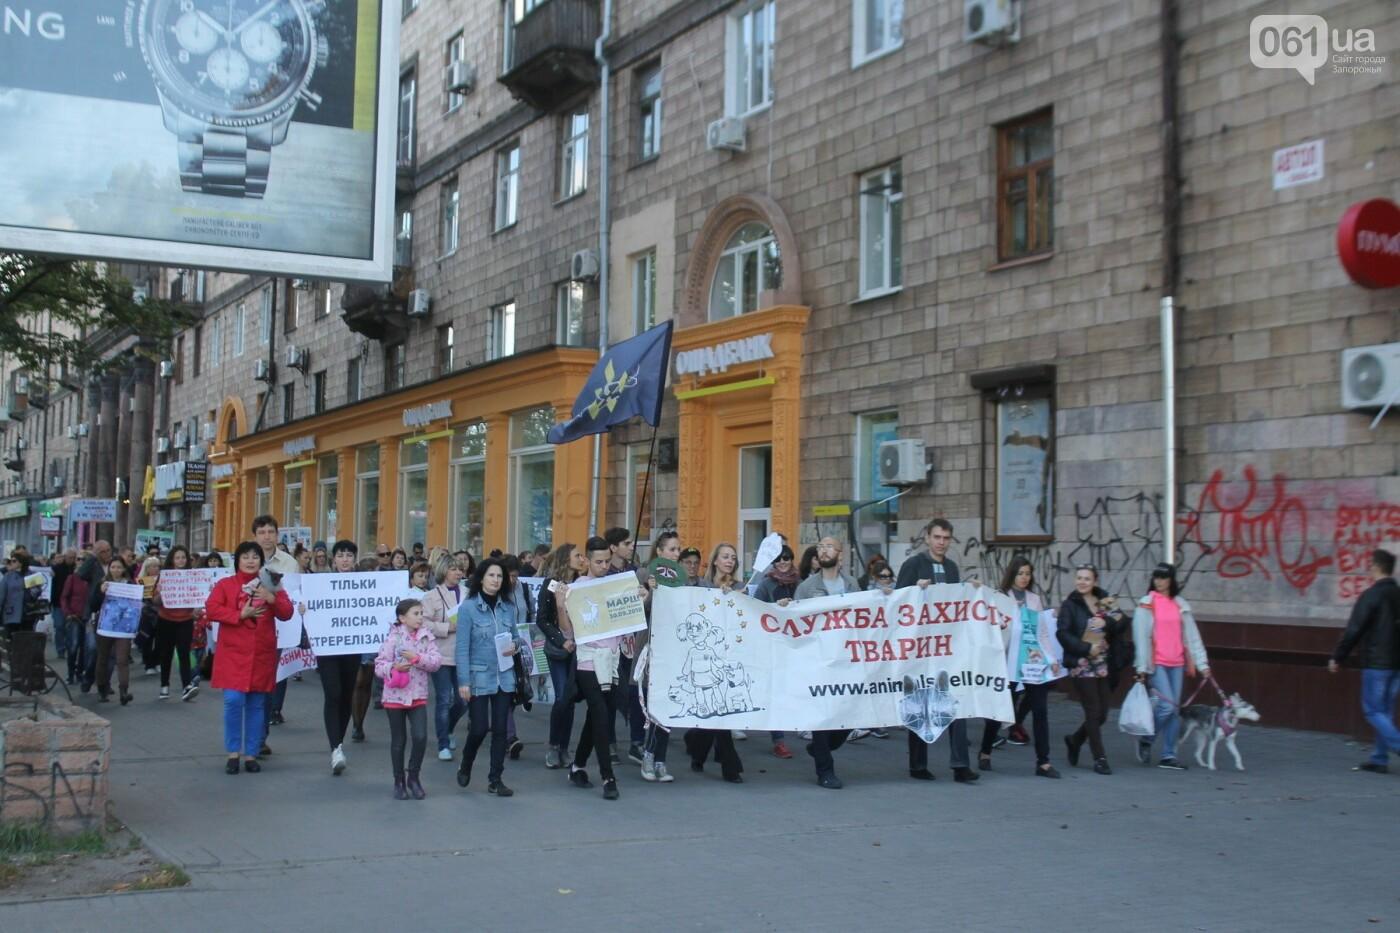 «Защити! Не мучай»: в Запорожье провели марш за права животных, – ФОТОРЕПОРТАЖ, ВИДЕО, фото-25